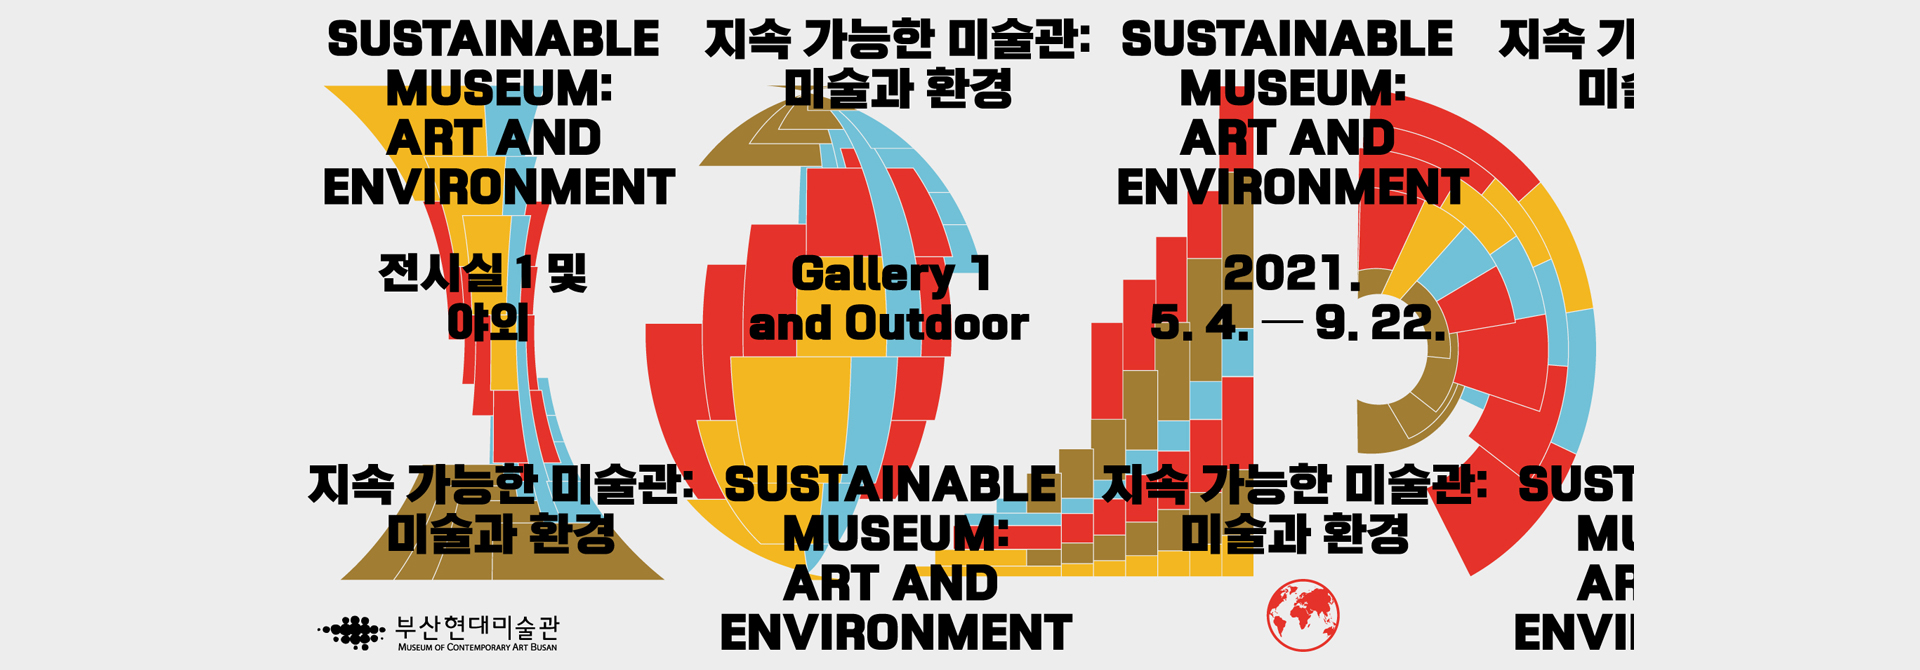 SUSTAINABLE MUSEUM: ART AND ENVIRONMENT  전시실 1 및 야외  지속 가능한 미술관: 미술과 환경  Gallery 1 and Outdoor  SUSTAINABLE MUSEUM: ART AND ENVIRONMENT  SUSTAINABLE MUSEUM: ART AND ENVIRONMENT  2021. 5. 4. - 9. 22.  지속 가능한 미술관:미술과 환경